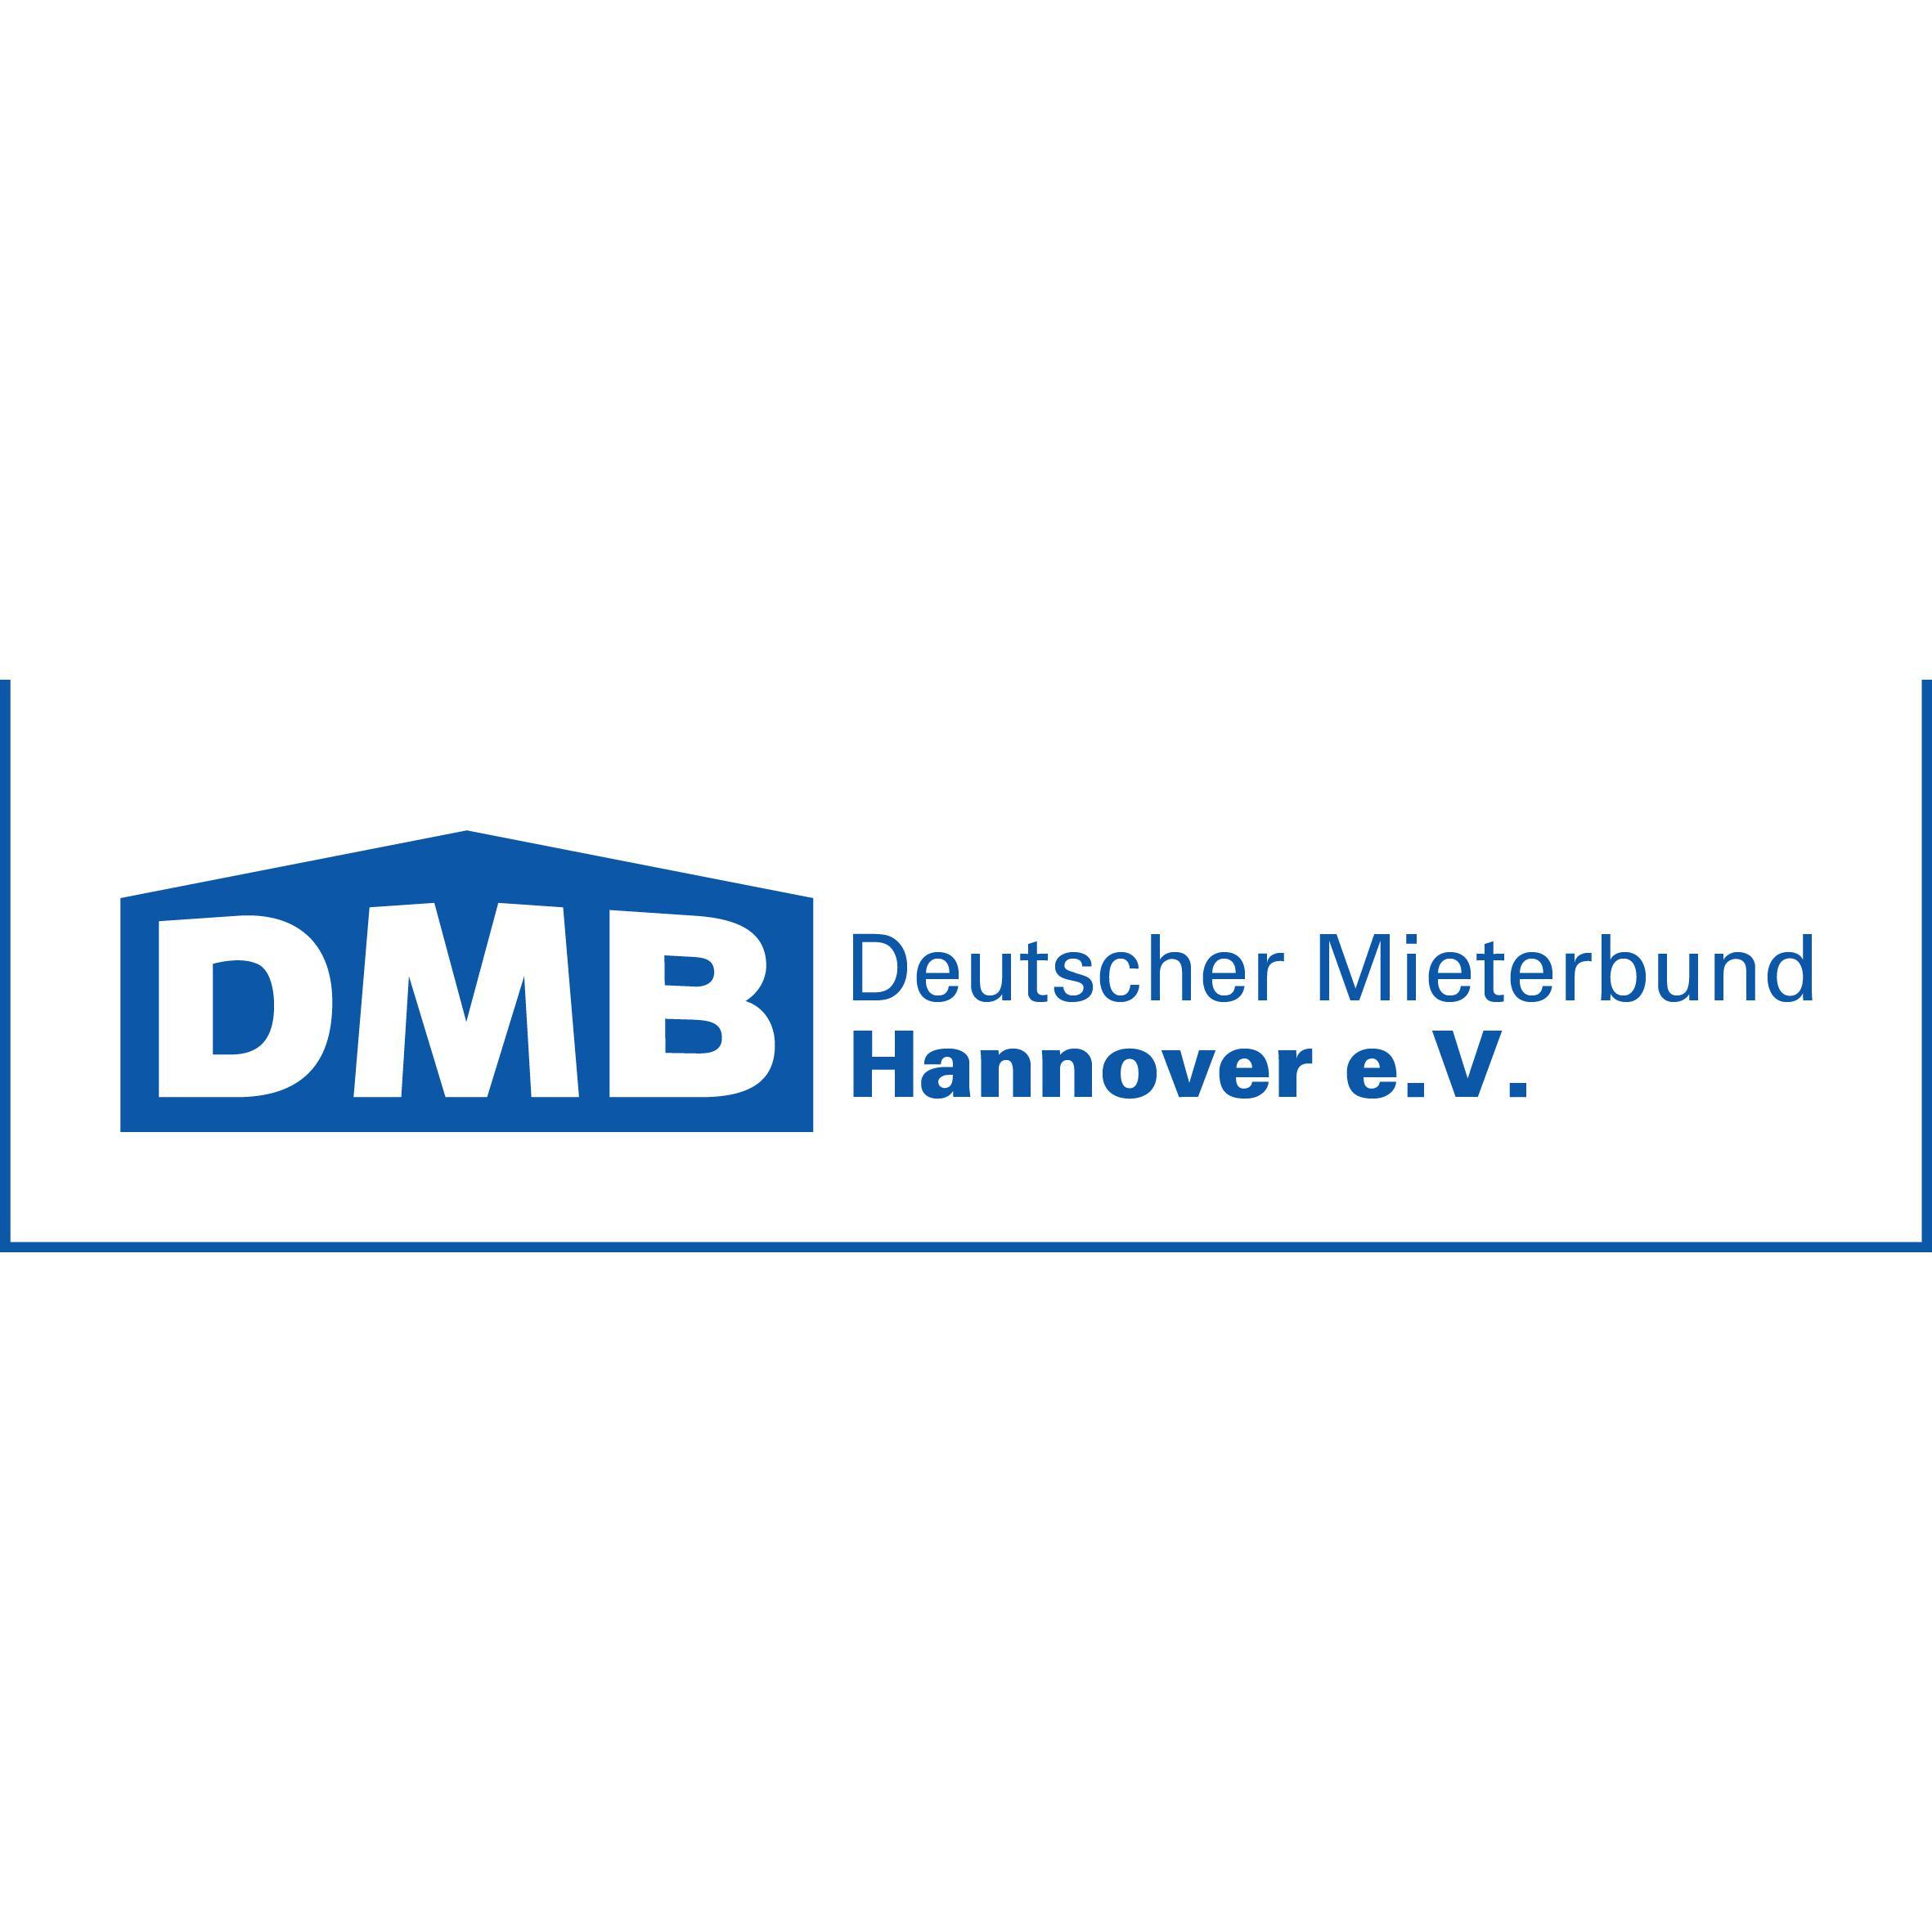 DMB Deutscher Mieterbund Hannover e.V.